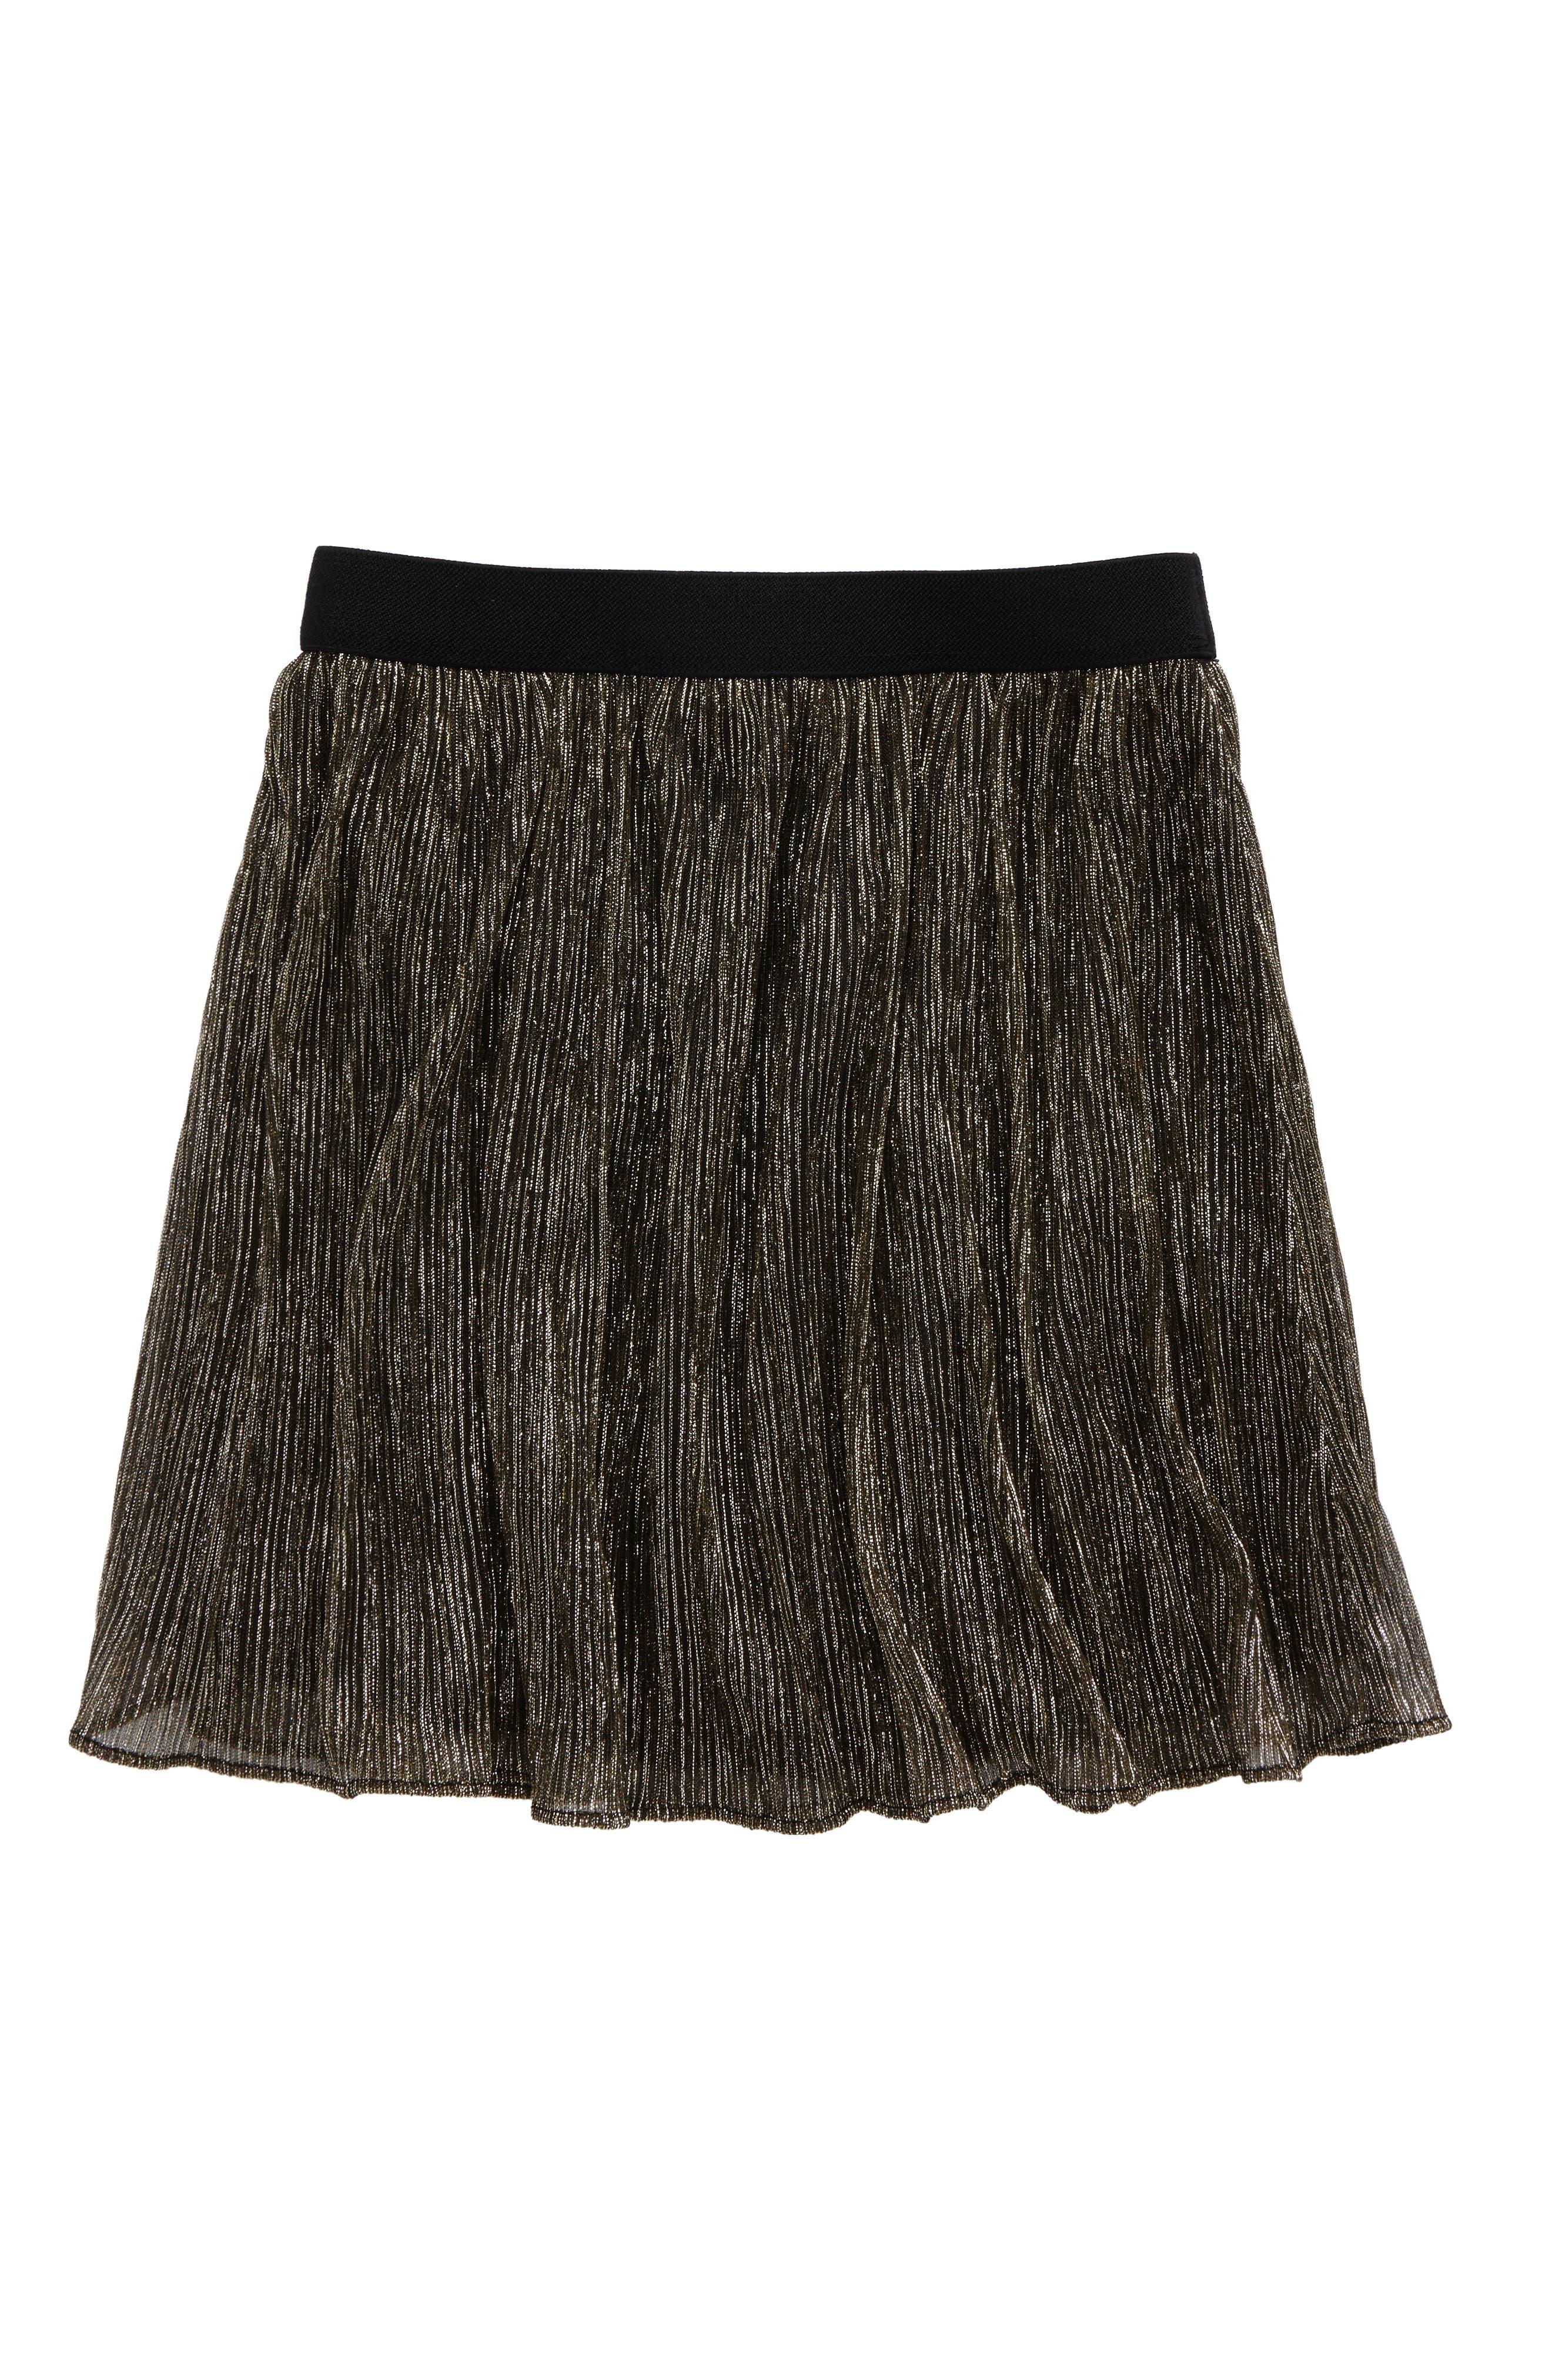 Pleated Metallic Skirt,                             Main thumbnail 1, color,                             Gold